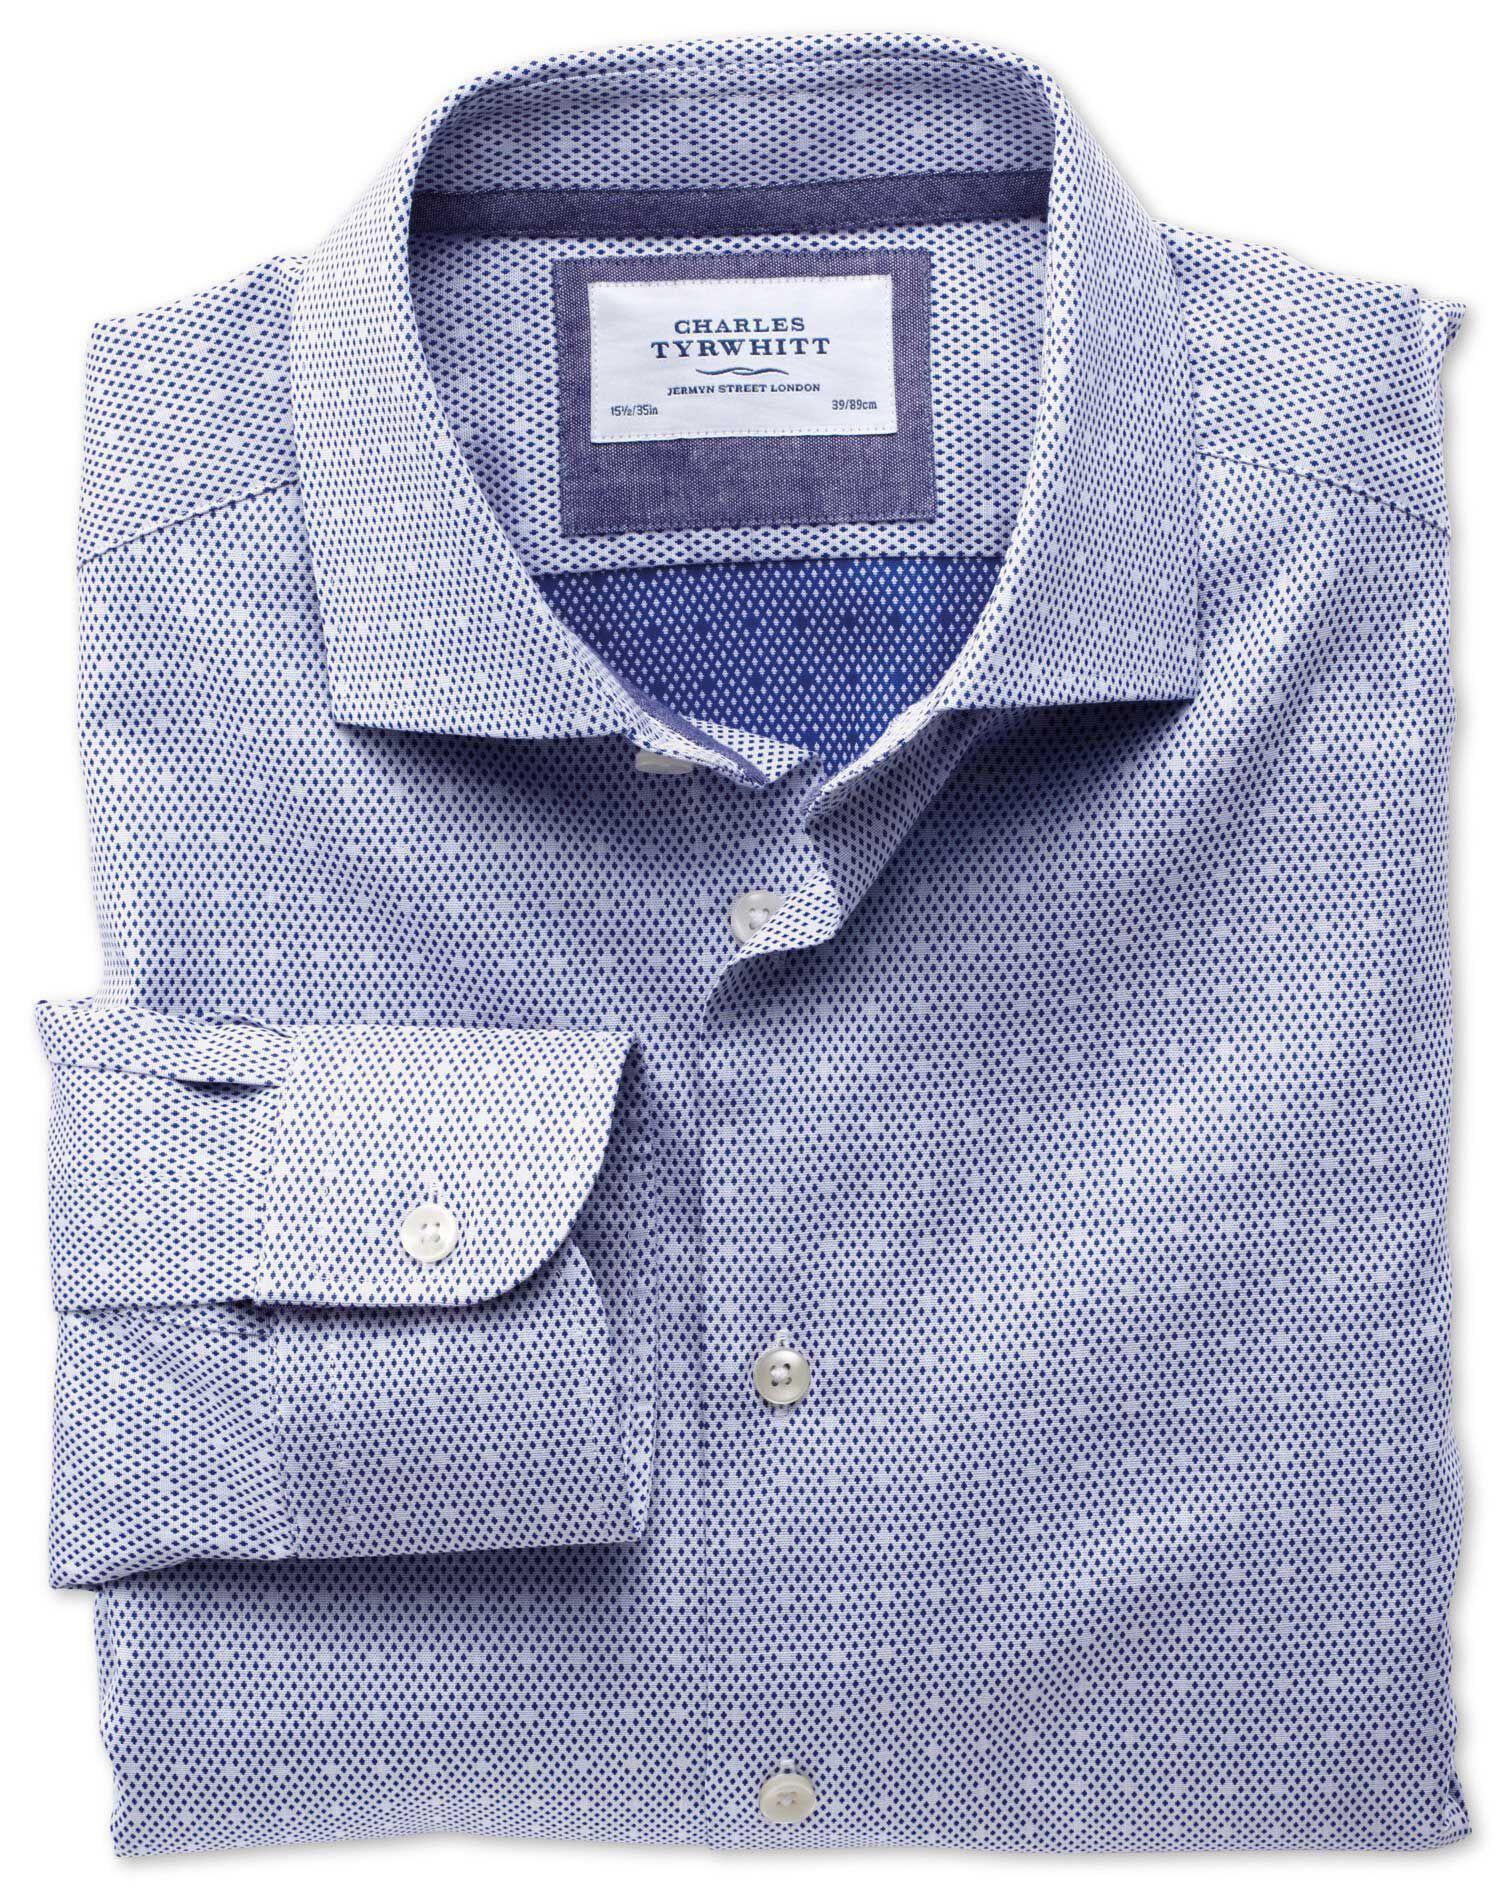 Extra Slim Fit Semi-Cutaway Collar Business Casual Dark Blue Egyptian Cotton Formal Shirt Single Cuf